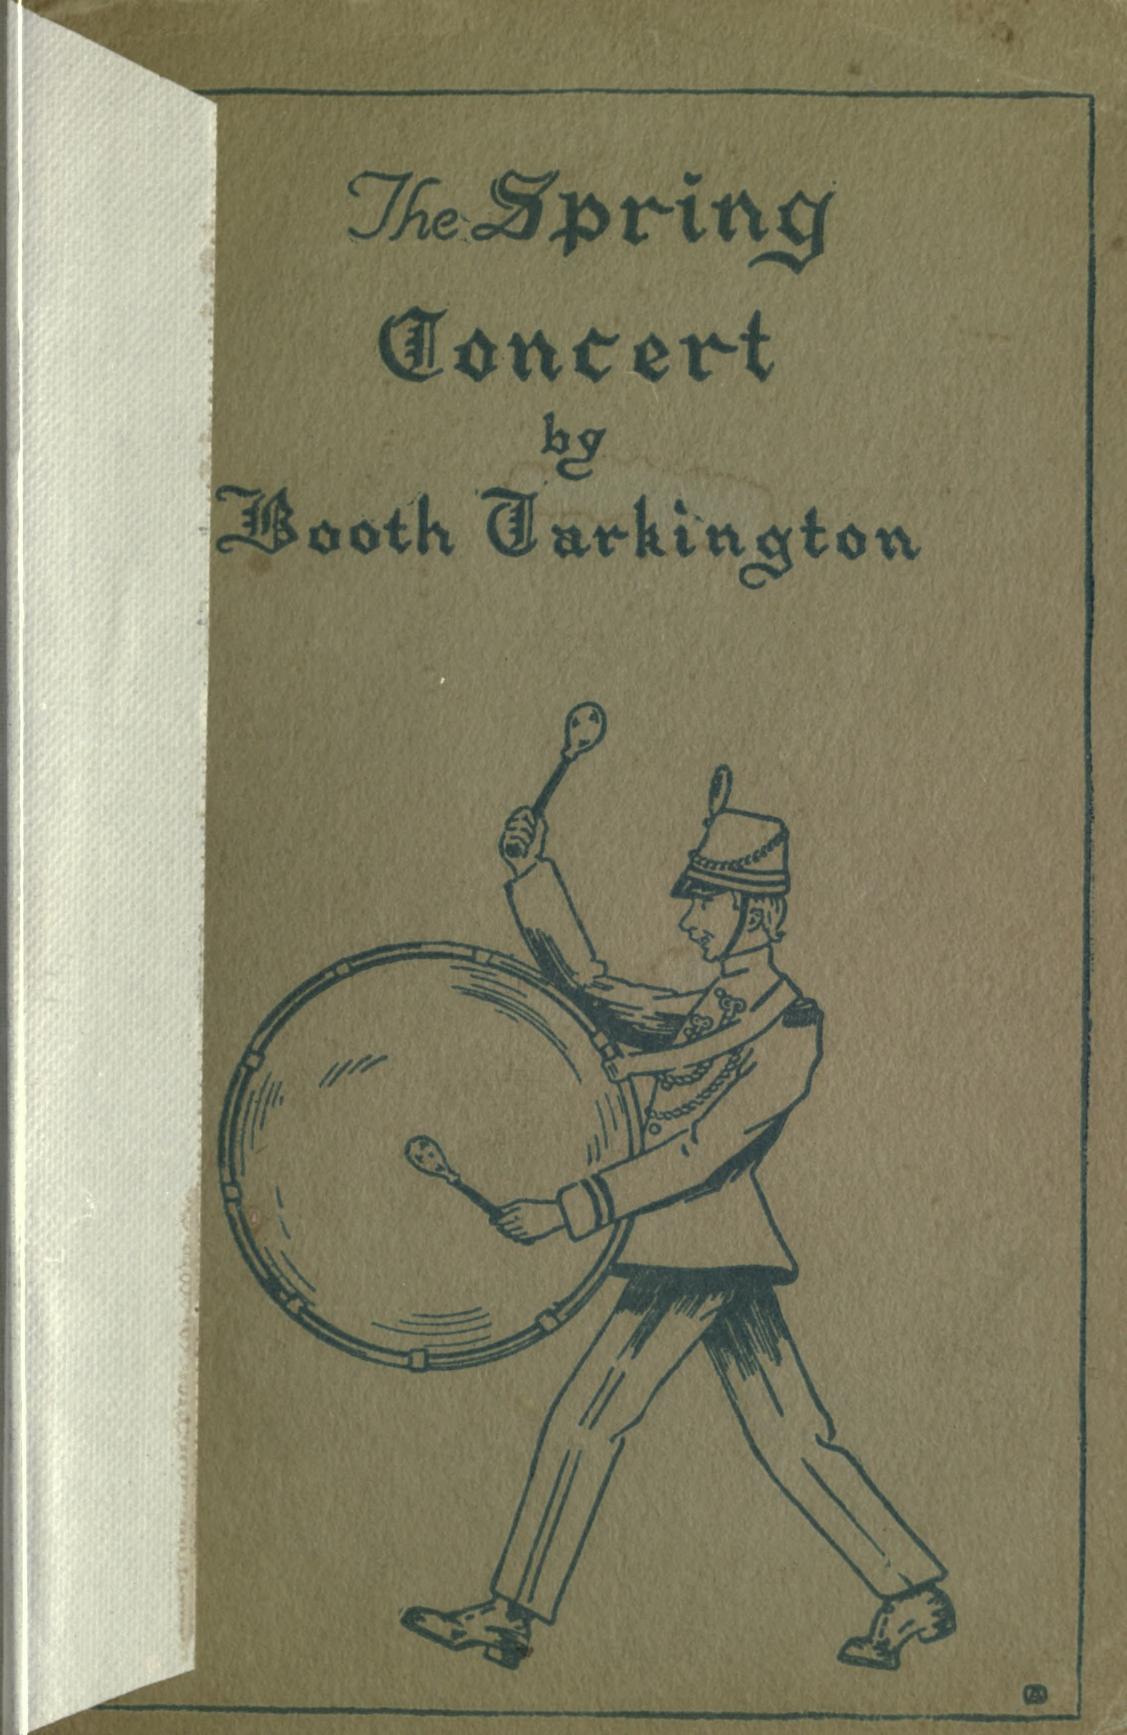 The Spring Concert Booth Tarkington